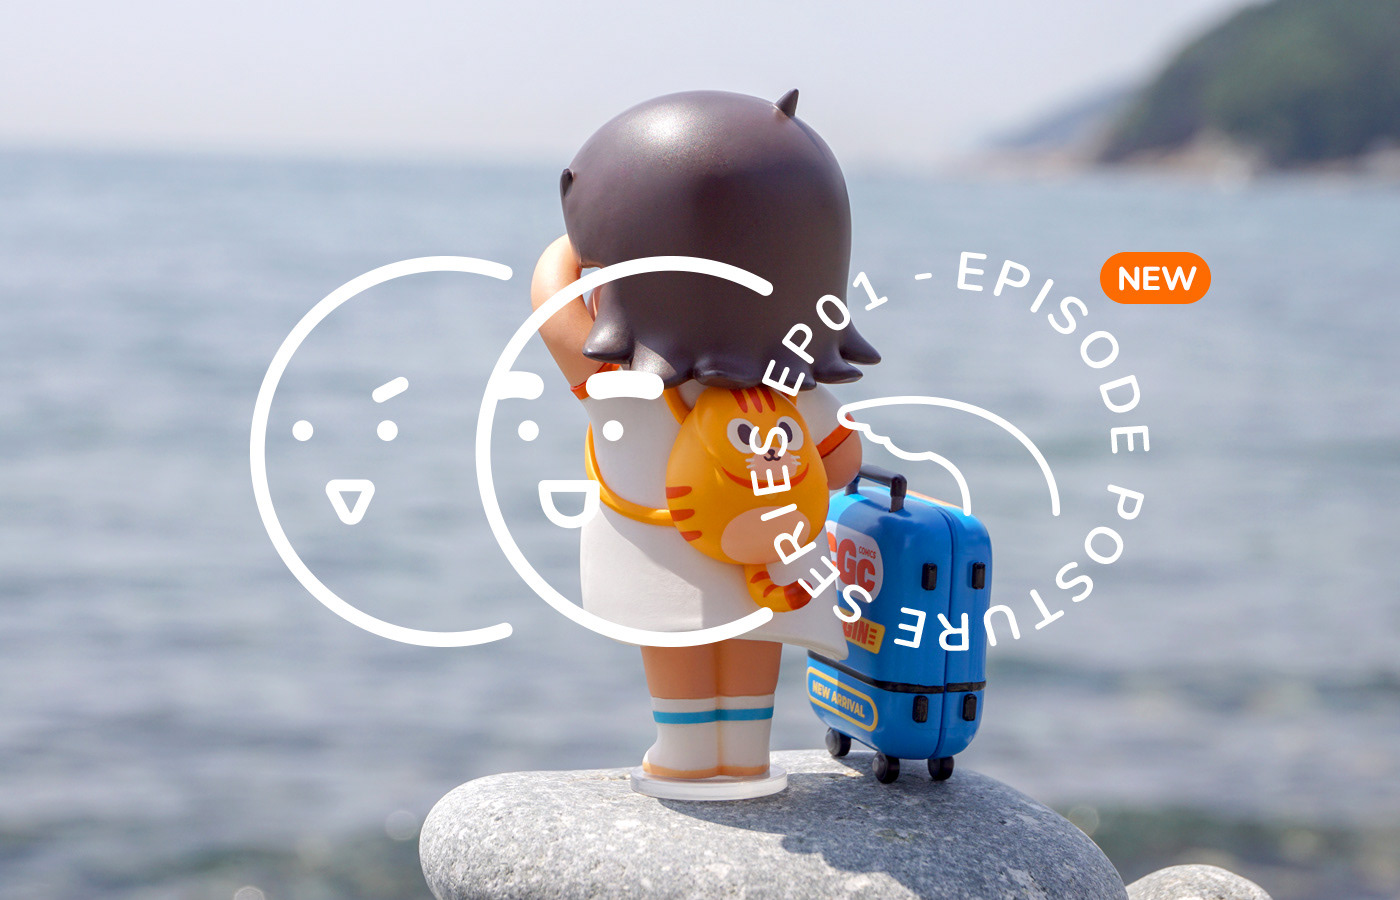 carrygrow Character characterdesign product design  Travel